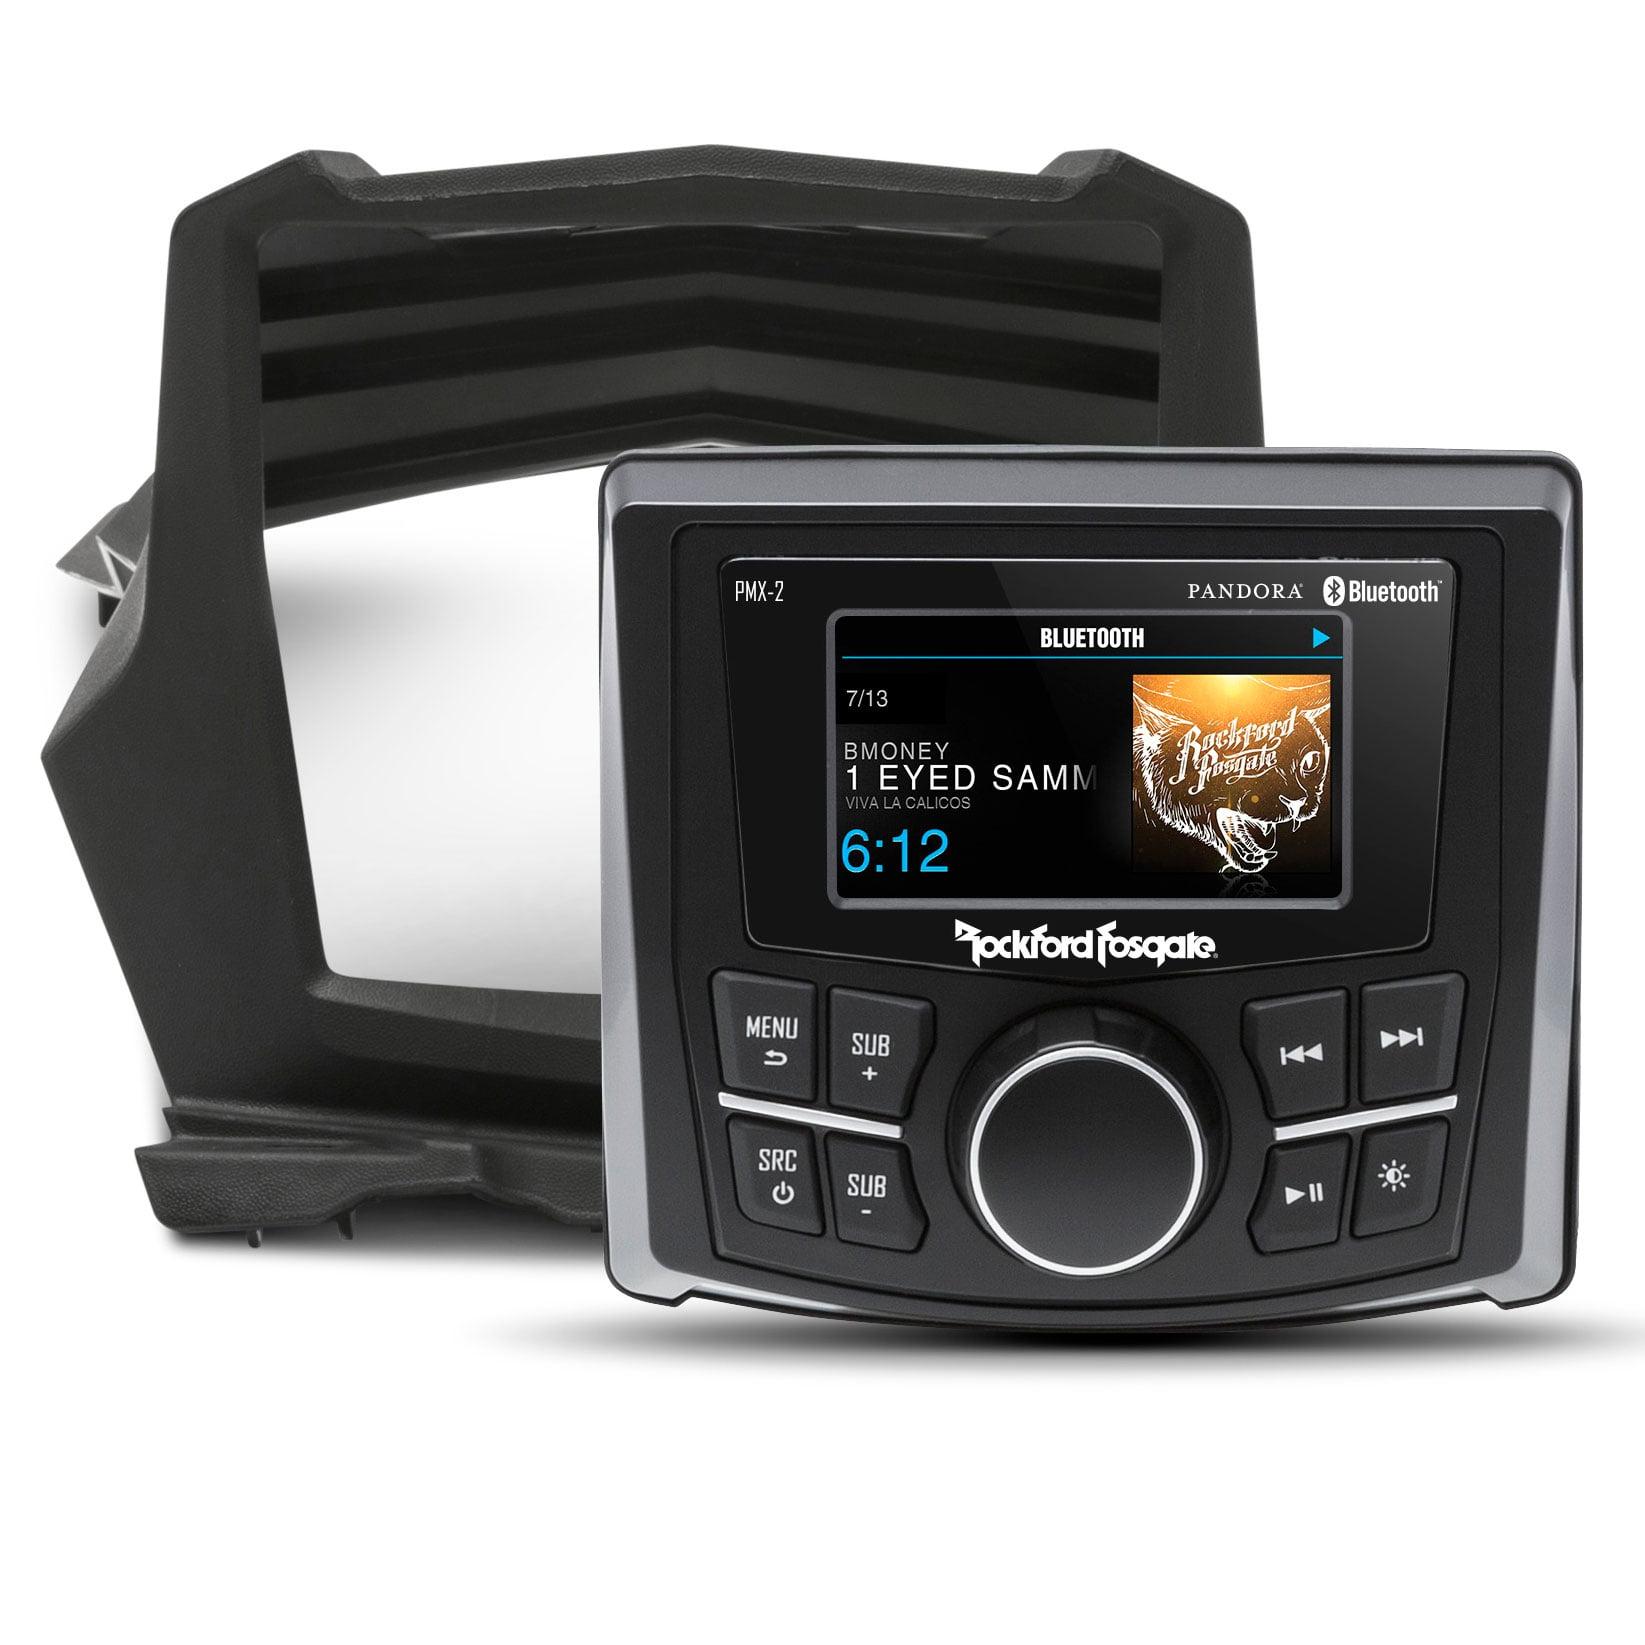 Rockford Fosgate Stereo Kit for Select Maverick X3 Models, PMX-2 & Dash Kit